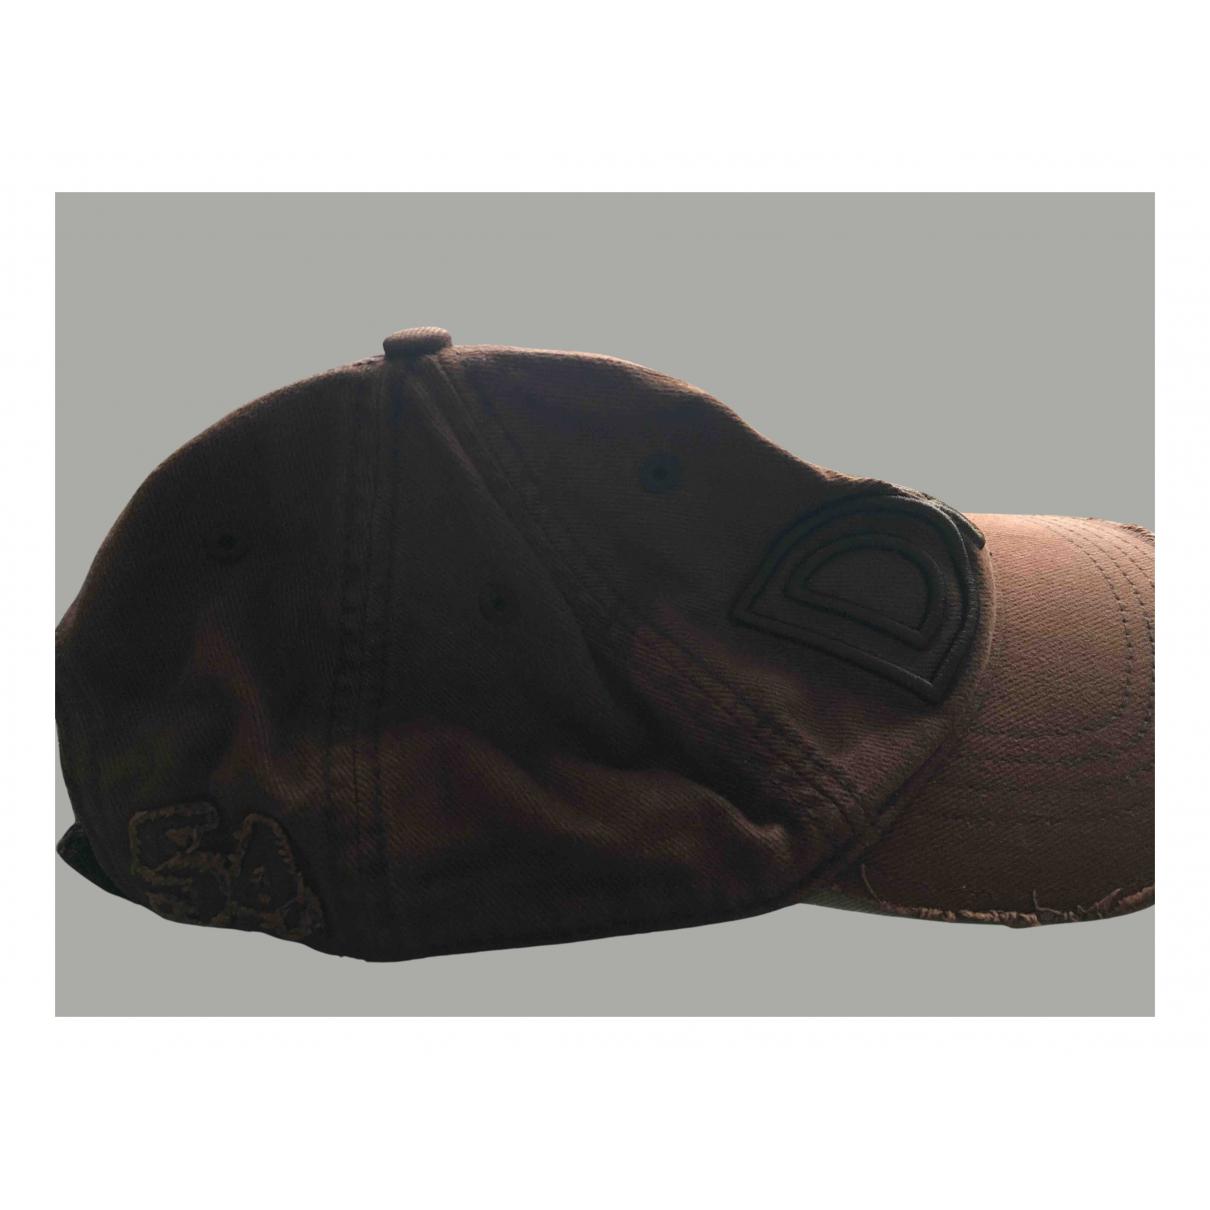 D&g N Brown Cotton hat & pull on hat for Men L International